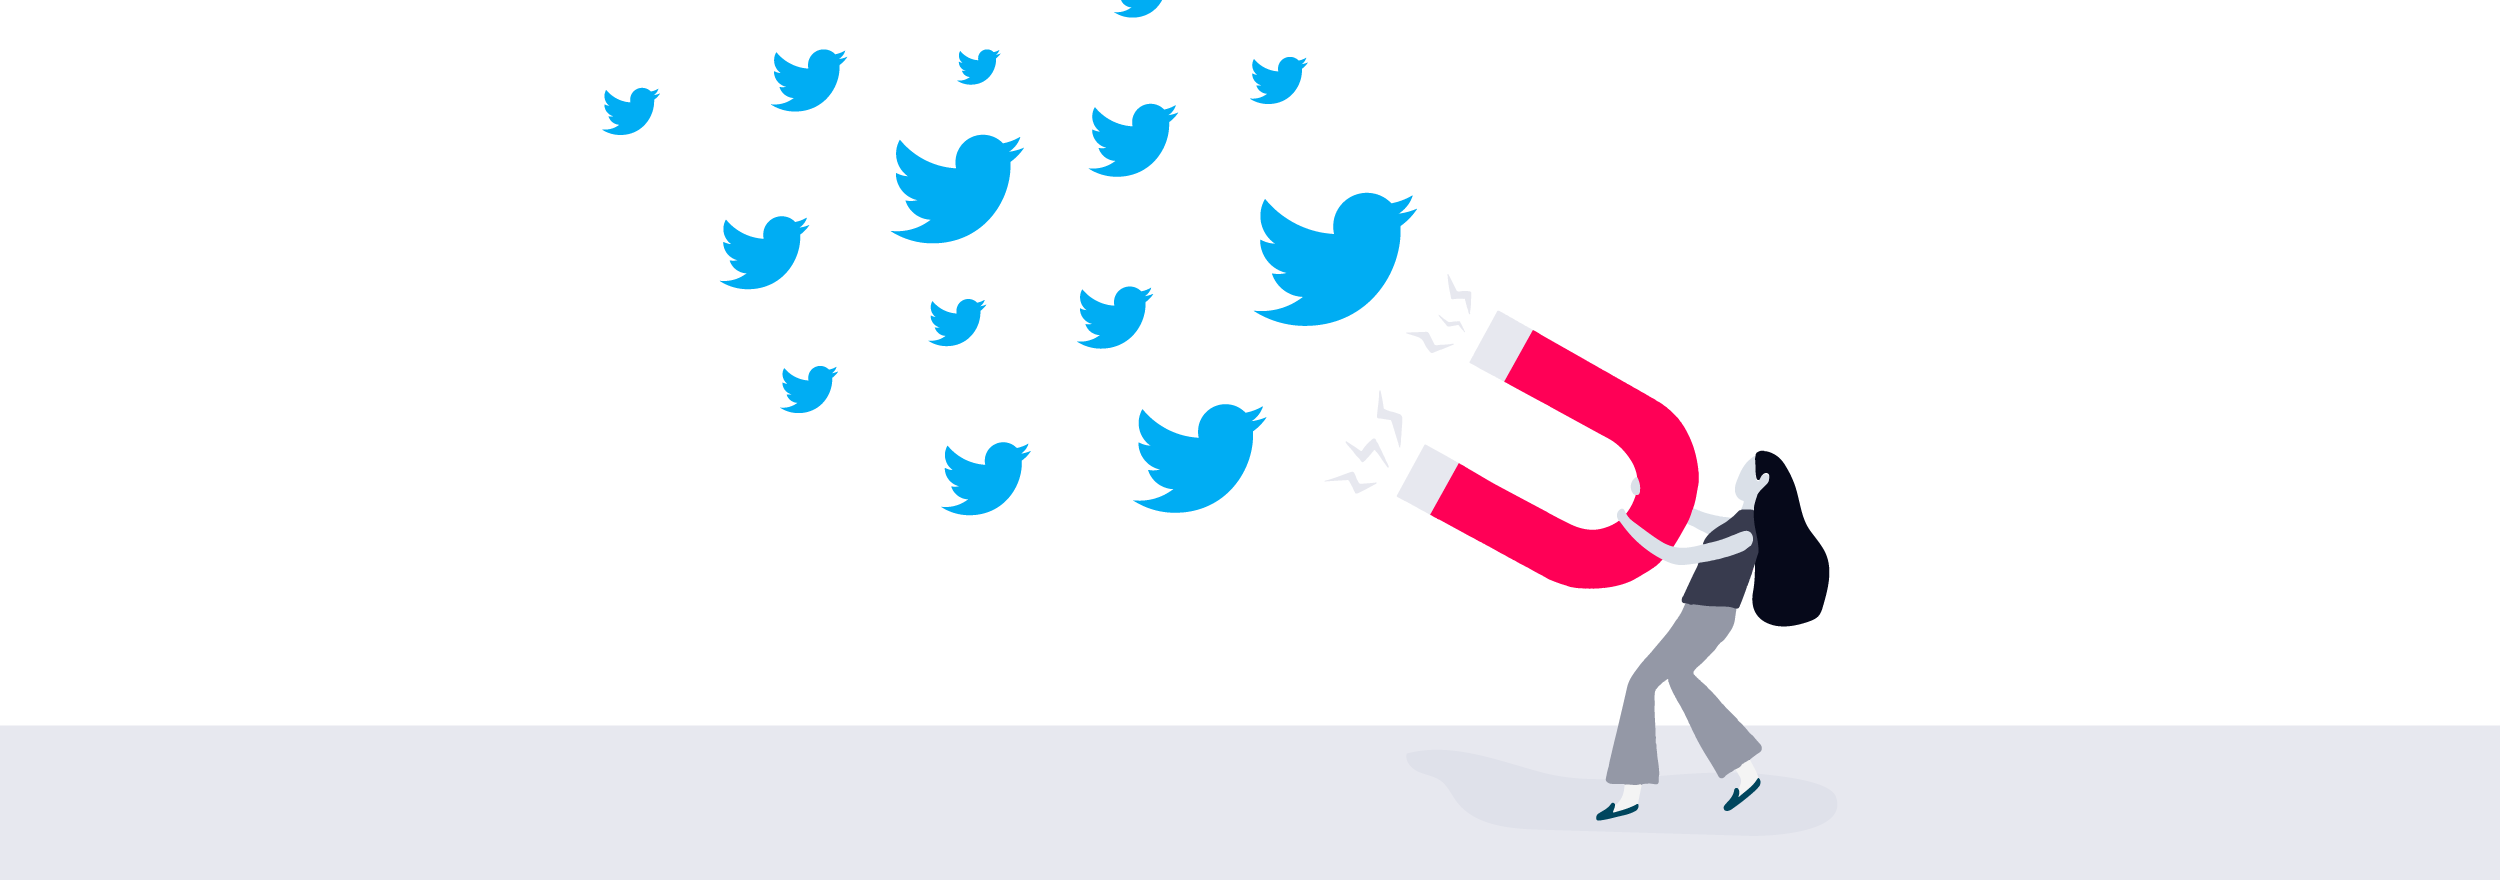 tweet n follow